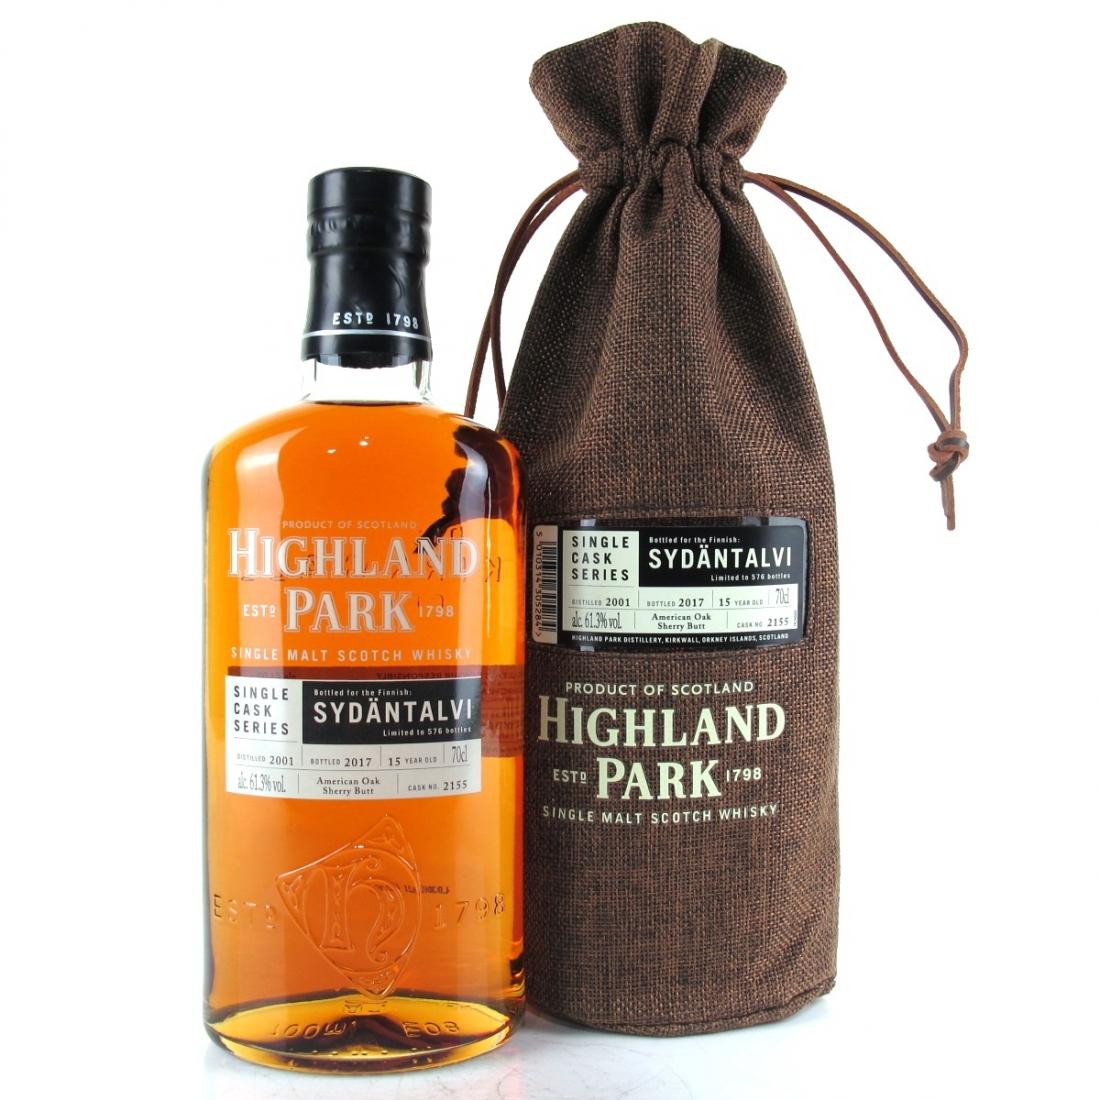 Highland Park 2001 Single Cask 15 Year Old #2155 / Sydantalvi